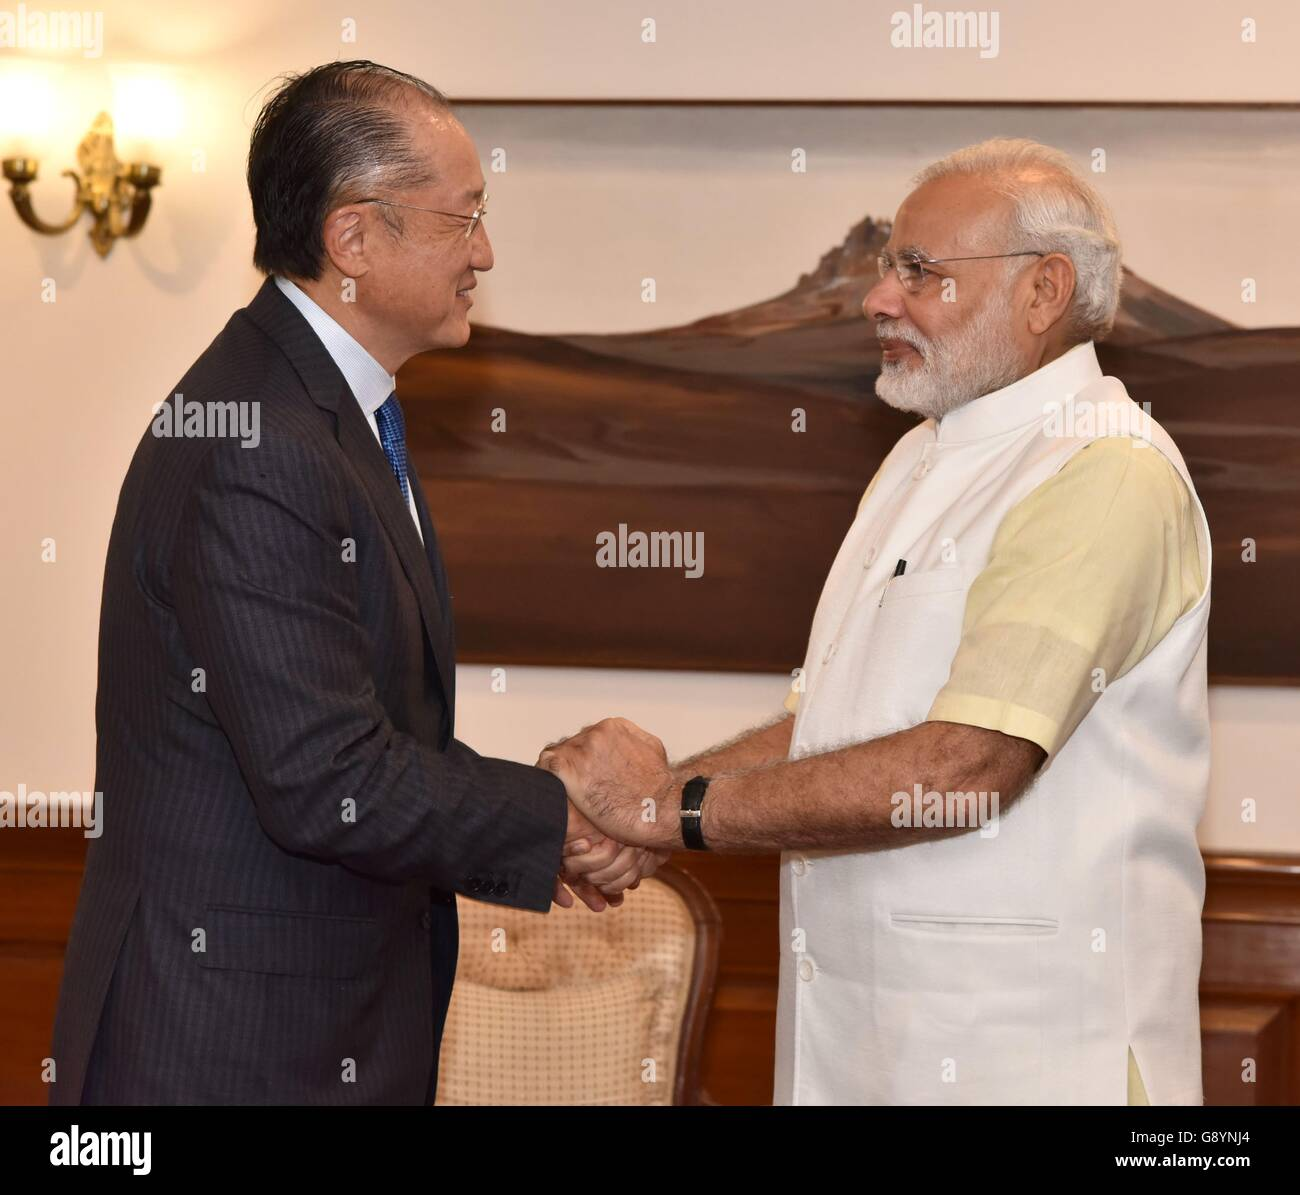 Indian Prime Minister Narendra Modi greets World Bank President Jim Yong Kim June 30, 2016 in New Dehli, India. - Stock Image